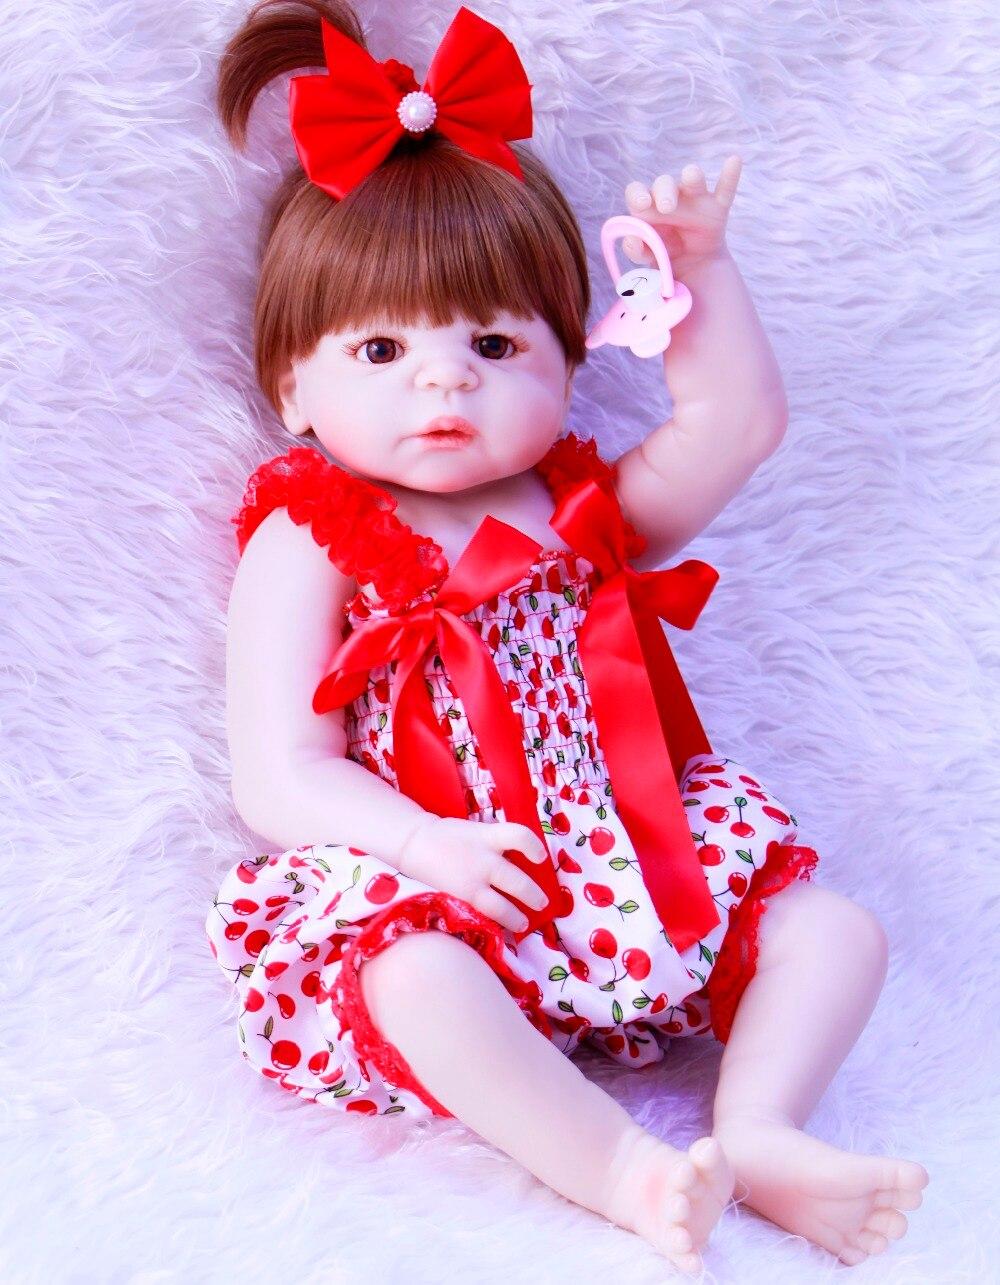 57cm Full Body Silicone Reborn Baby Doll Toys Bathe Toy  Baby-Reborn vinyl newborn wholesale reborn  toddlers kids presents toys57cm Full Body Silicone Reborn Baby Doll Toys Bathe Toy  Baby-Reborn vinyl newborn wholesale reborn  toddlers kids presents toys